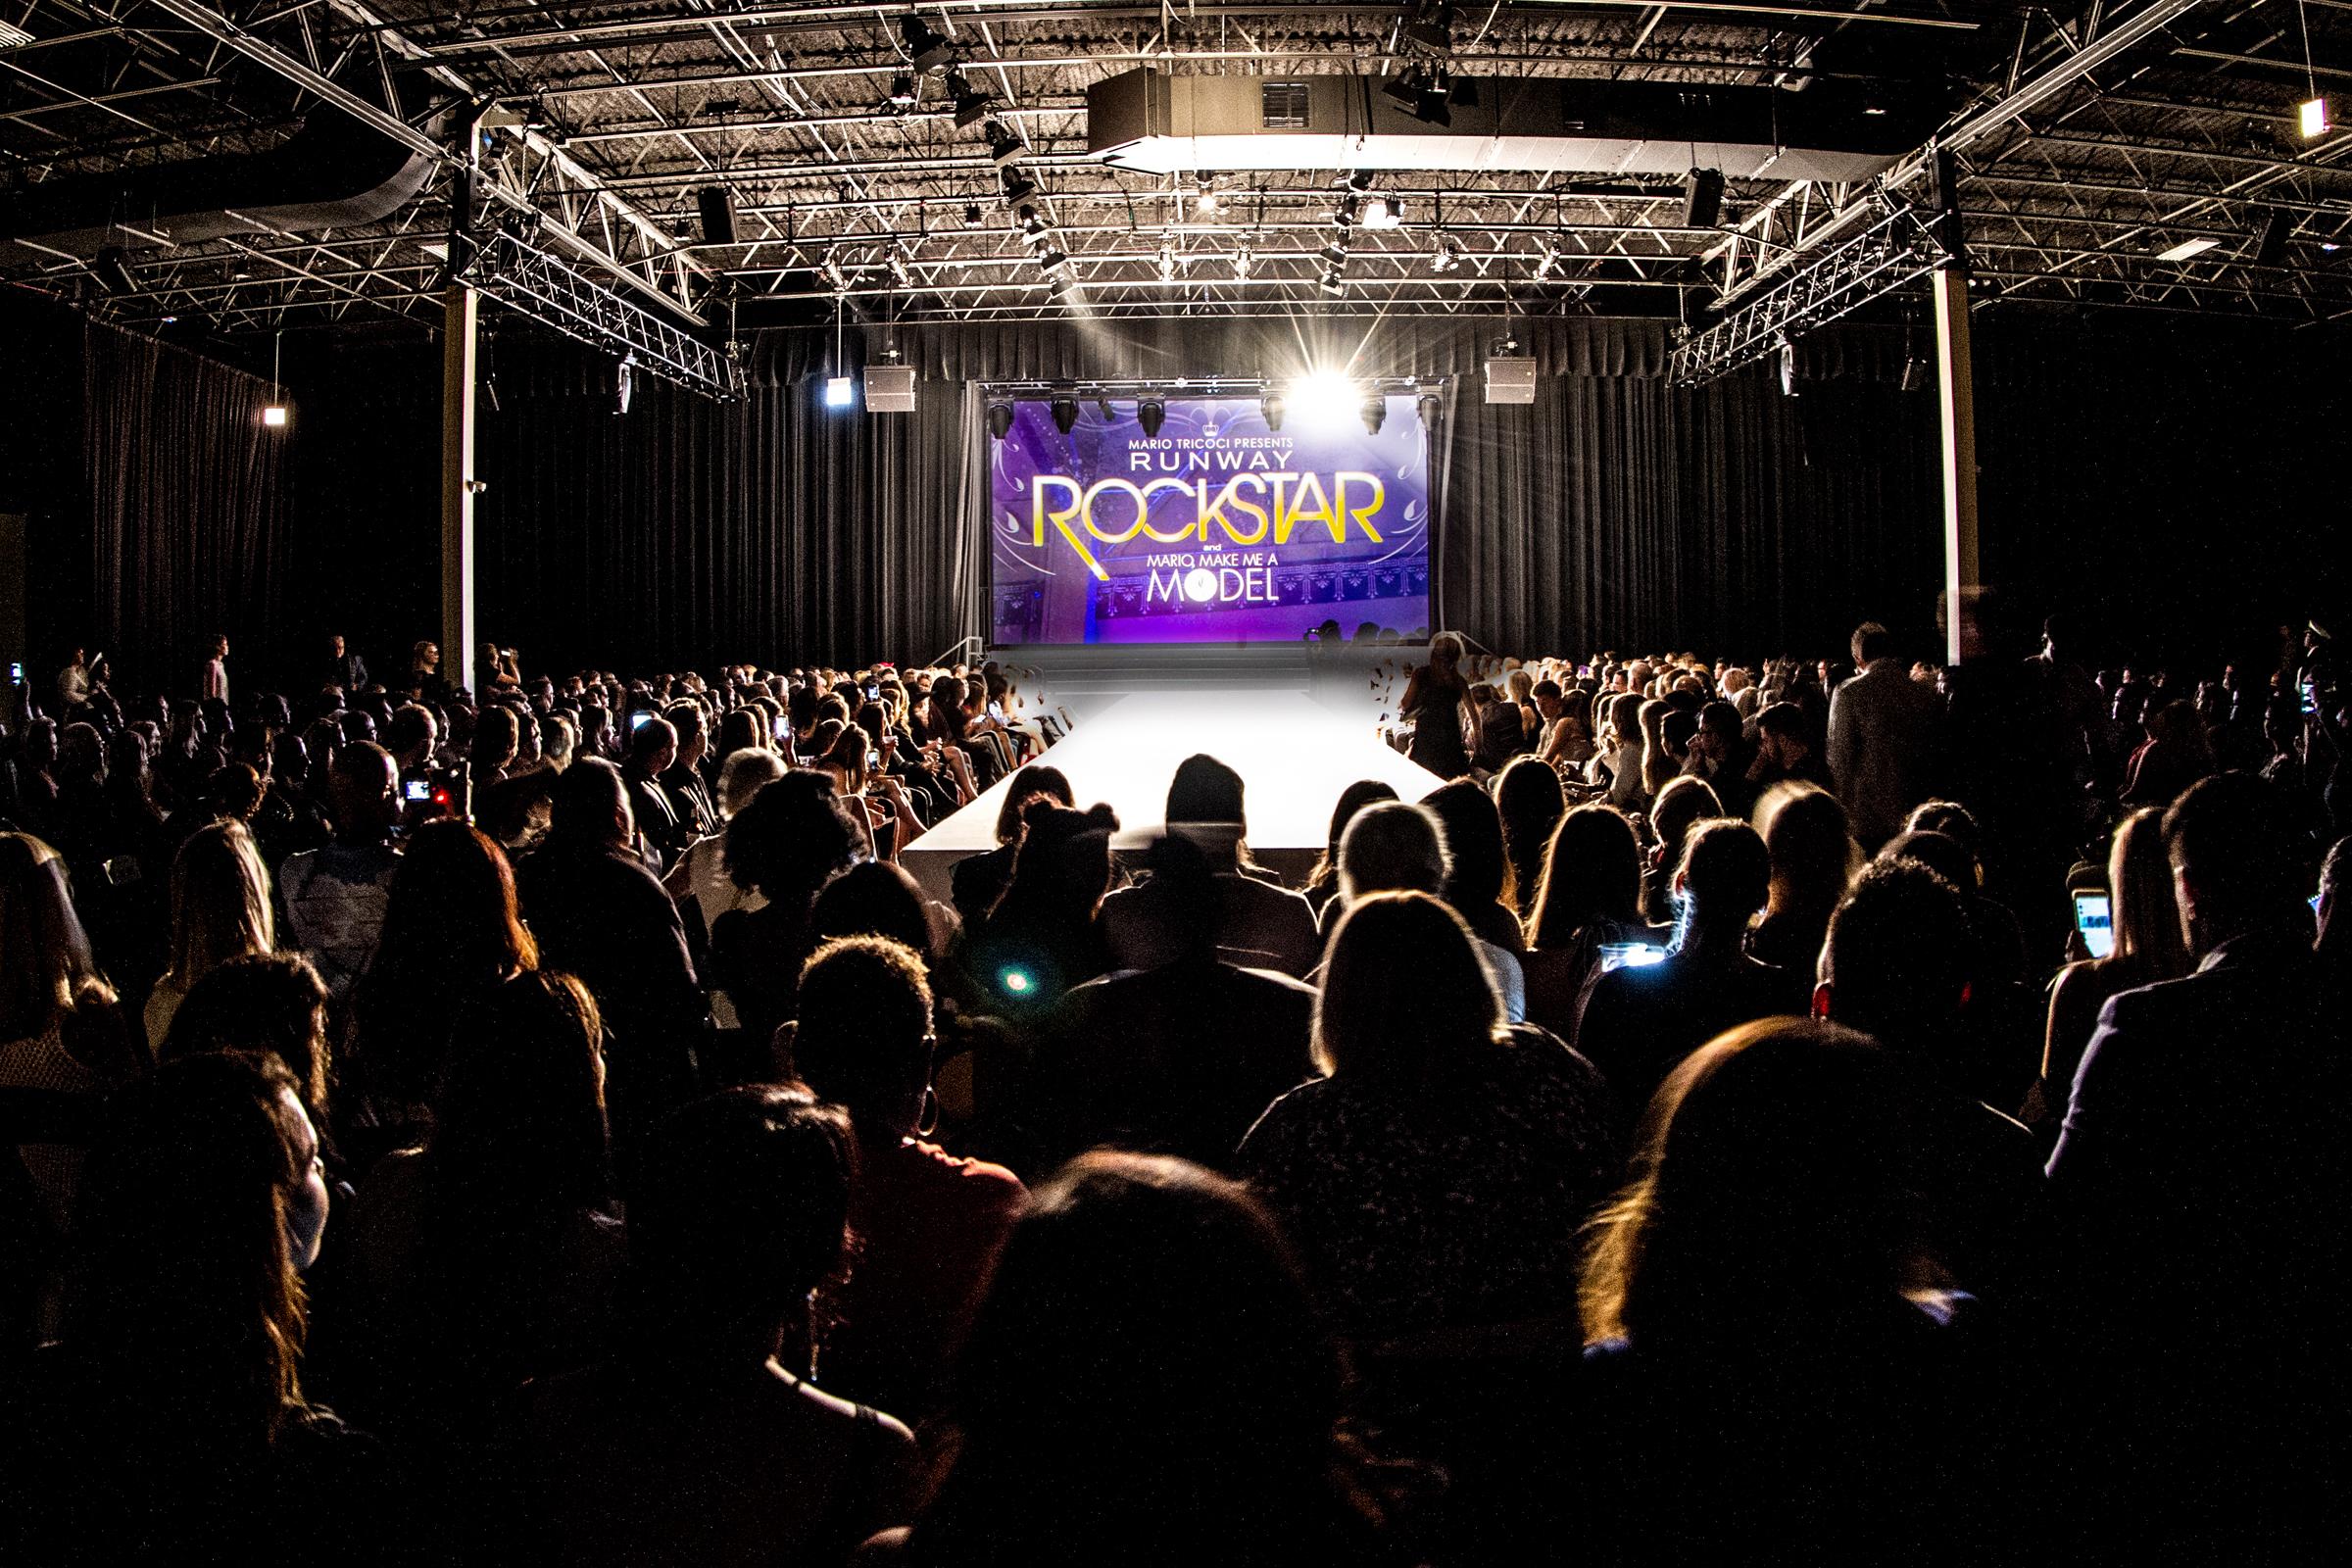 """Runway Rockstar"" Fashion Show at The Geraghty - The Geraghty"